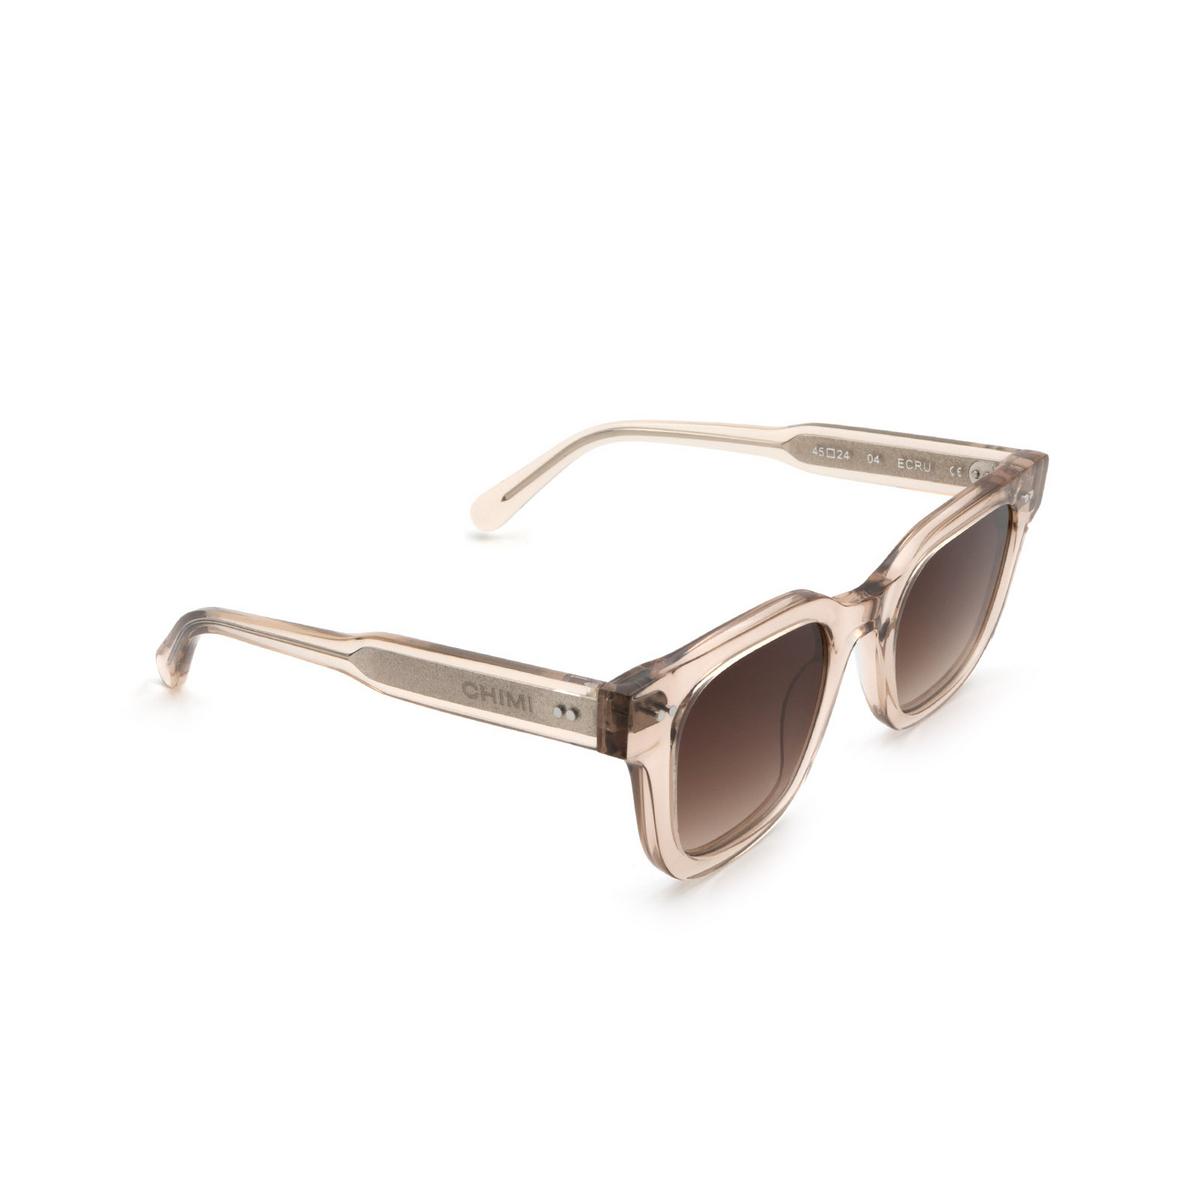 Chimi® Square Sunglasses: 04 color Ecru - three-quarters view.